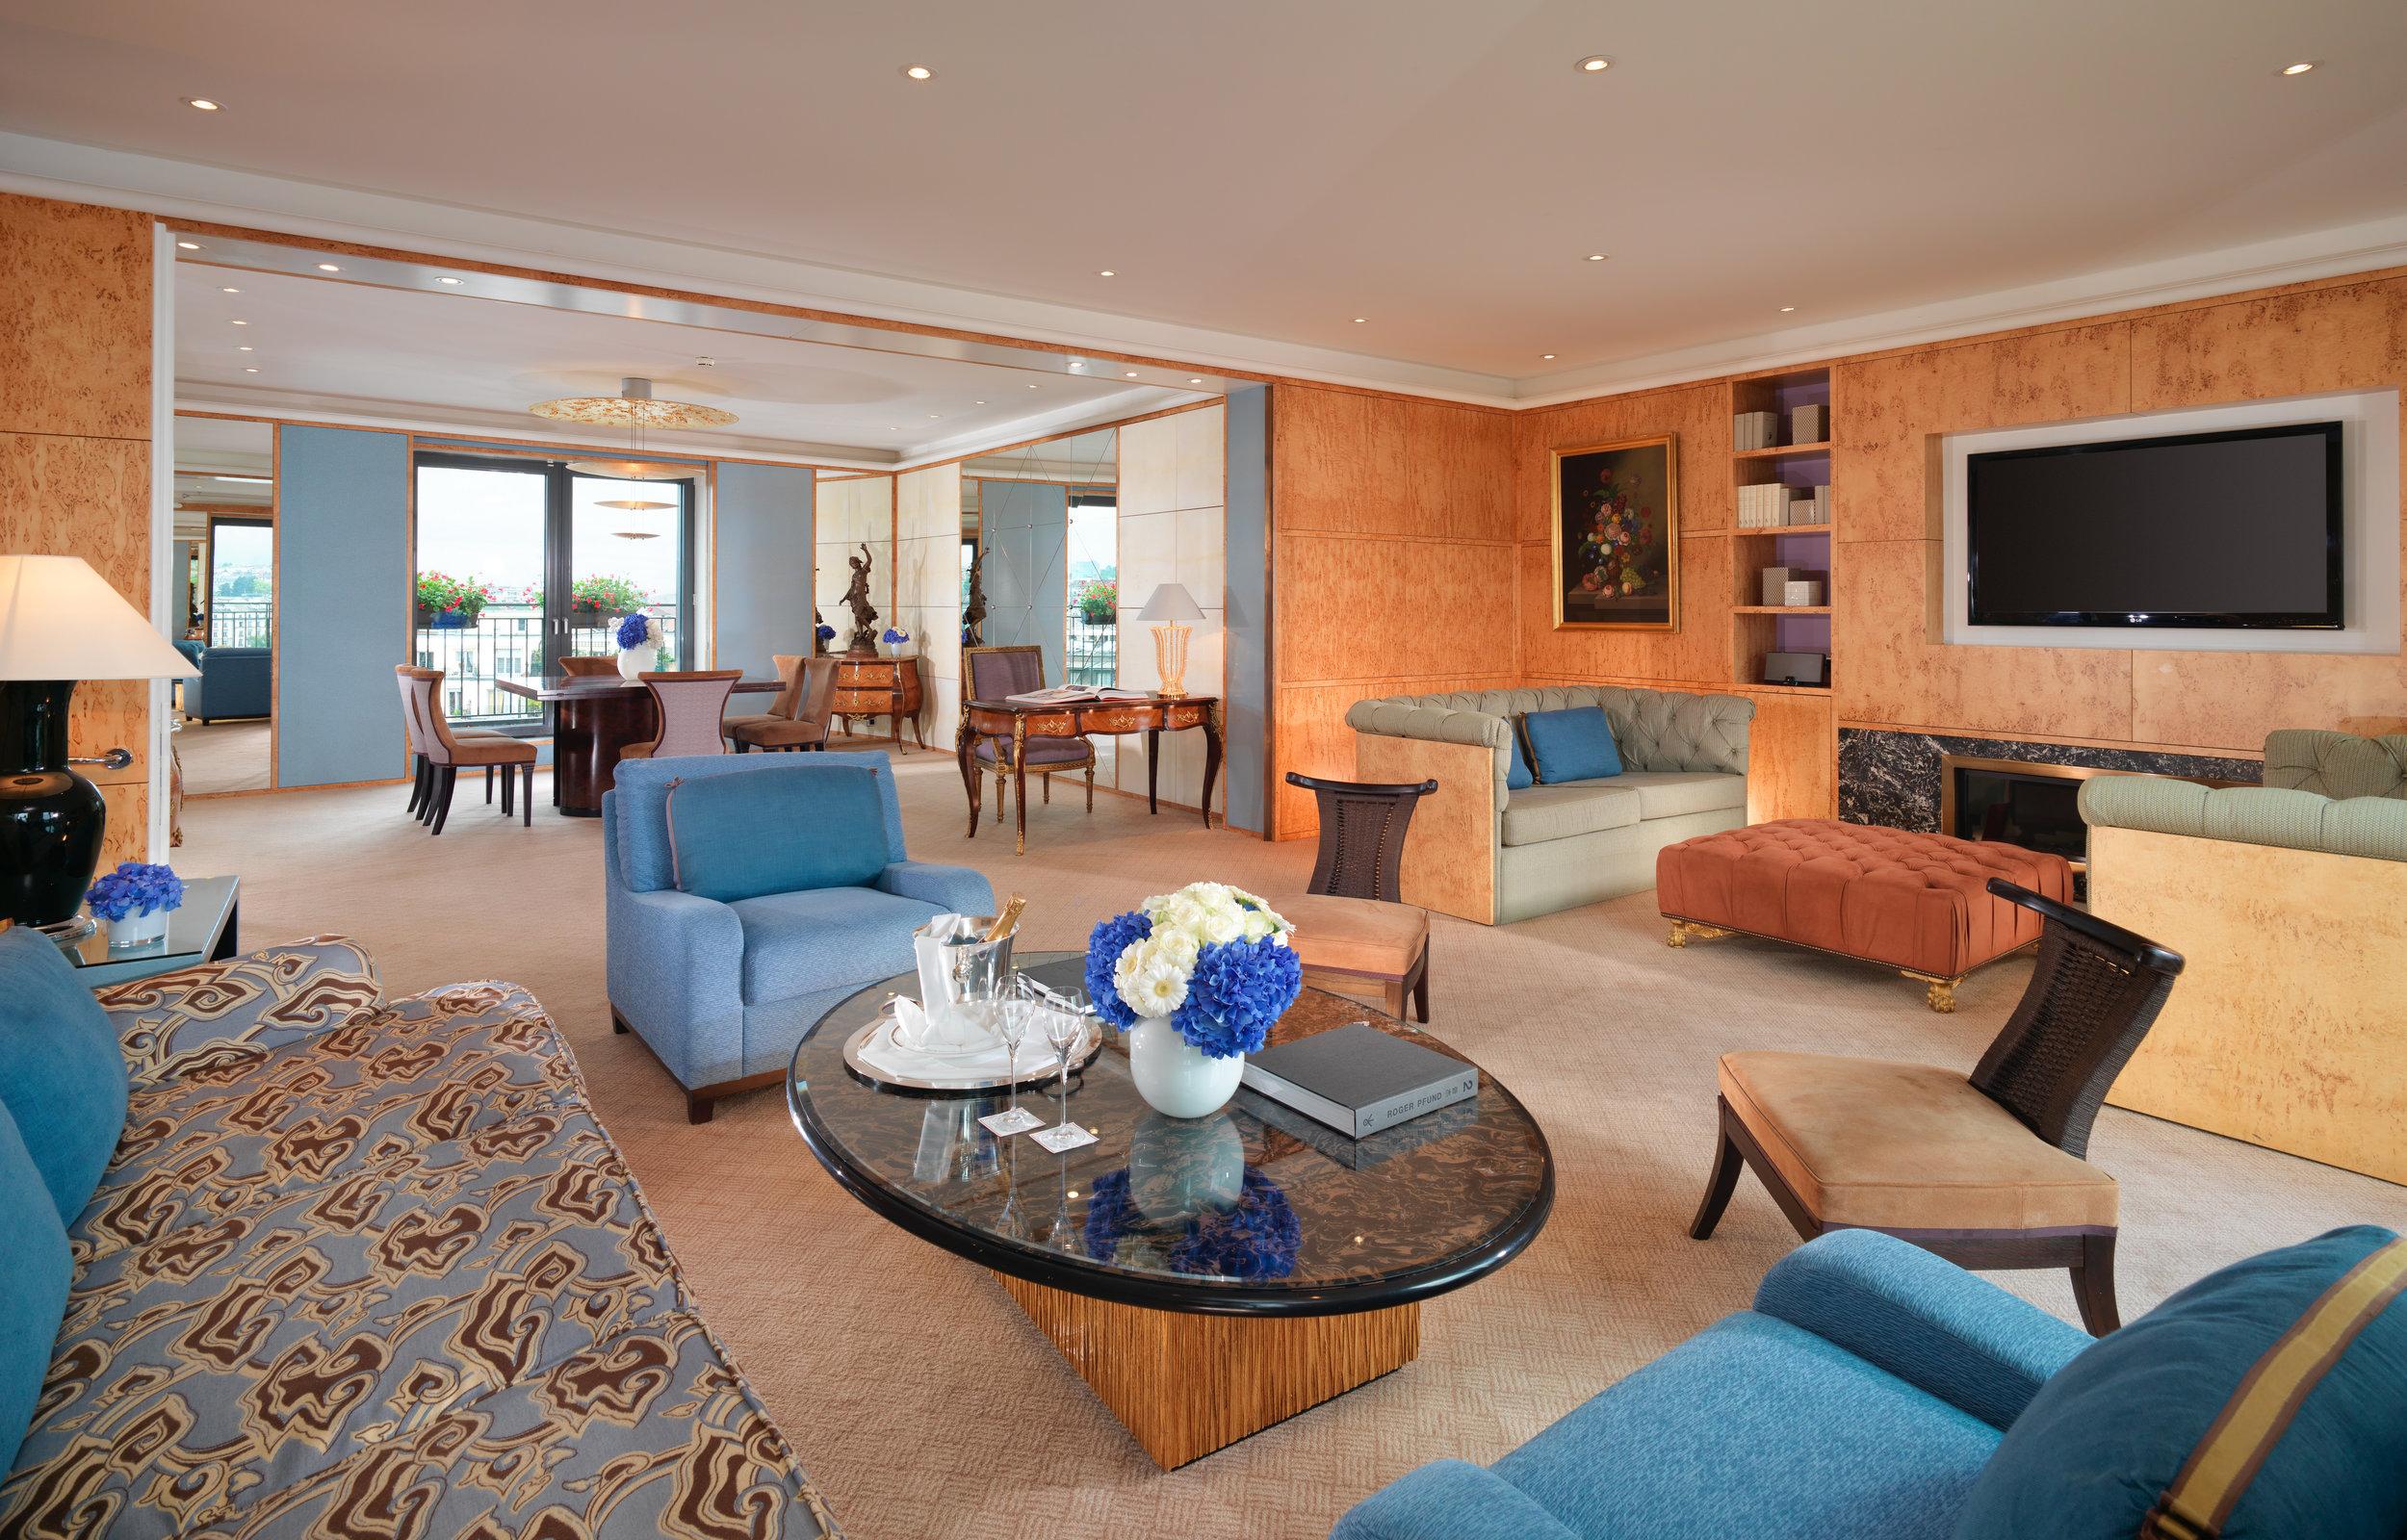 Le Richemond LRG_Armleder Suite Living Room.jpg